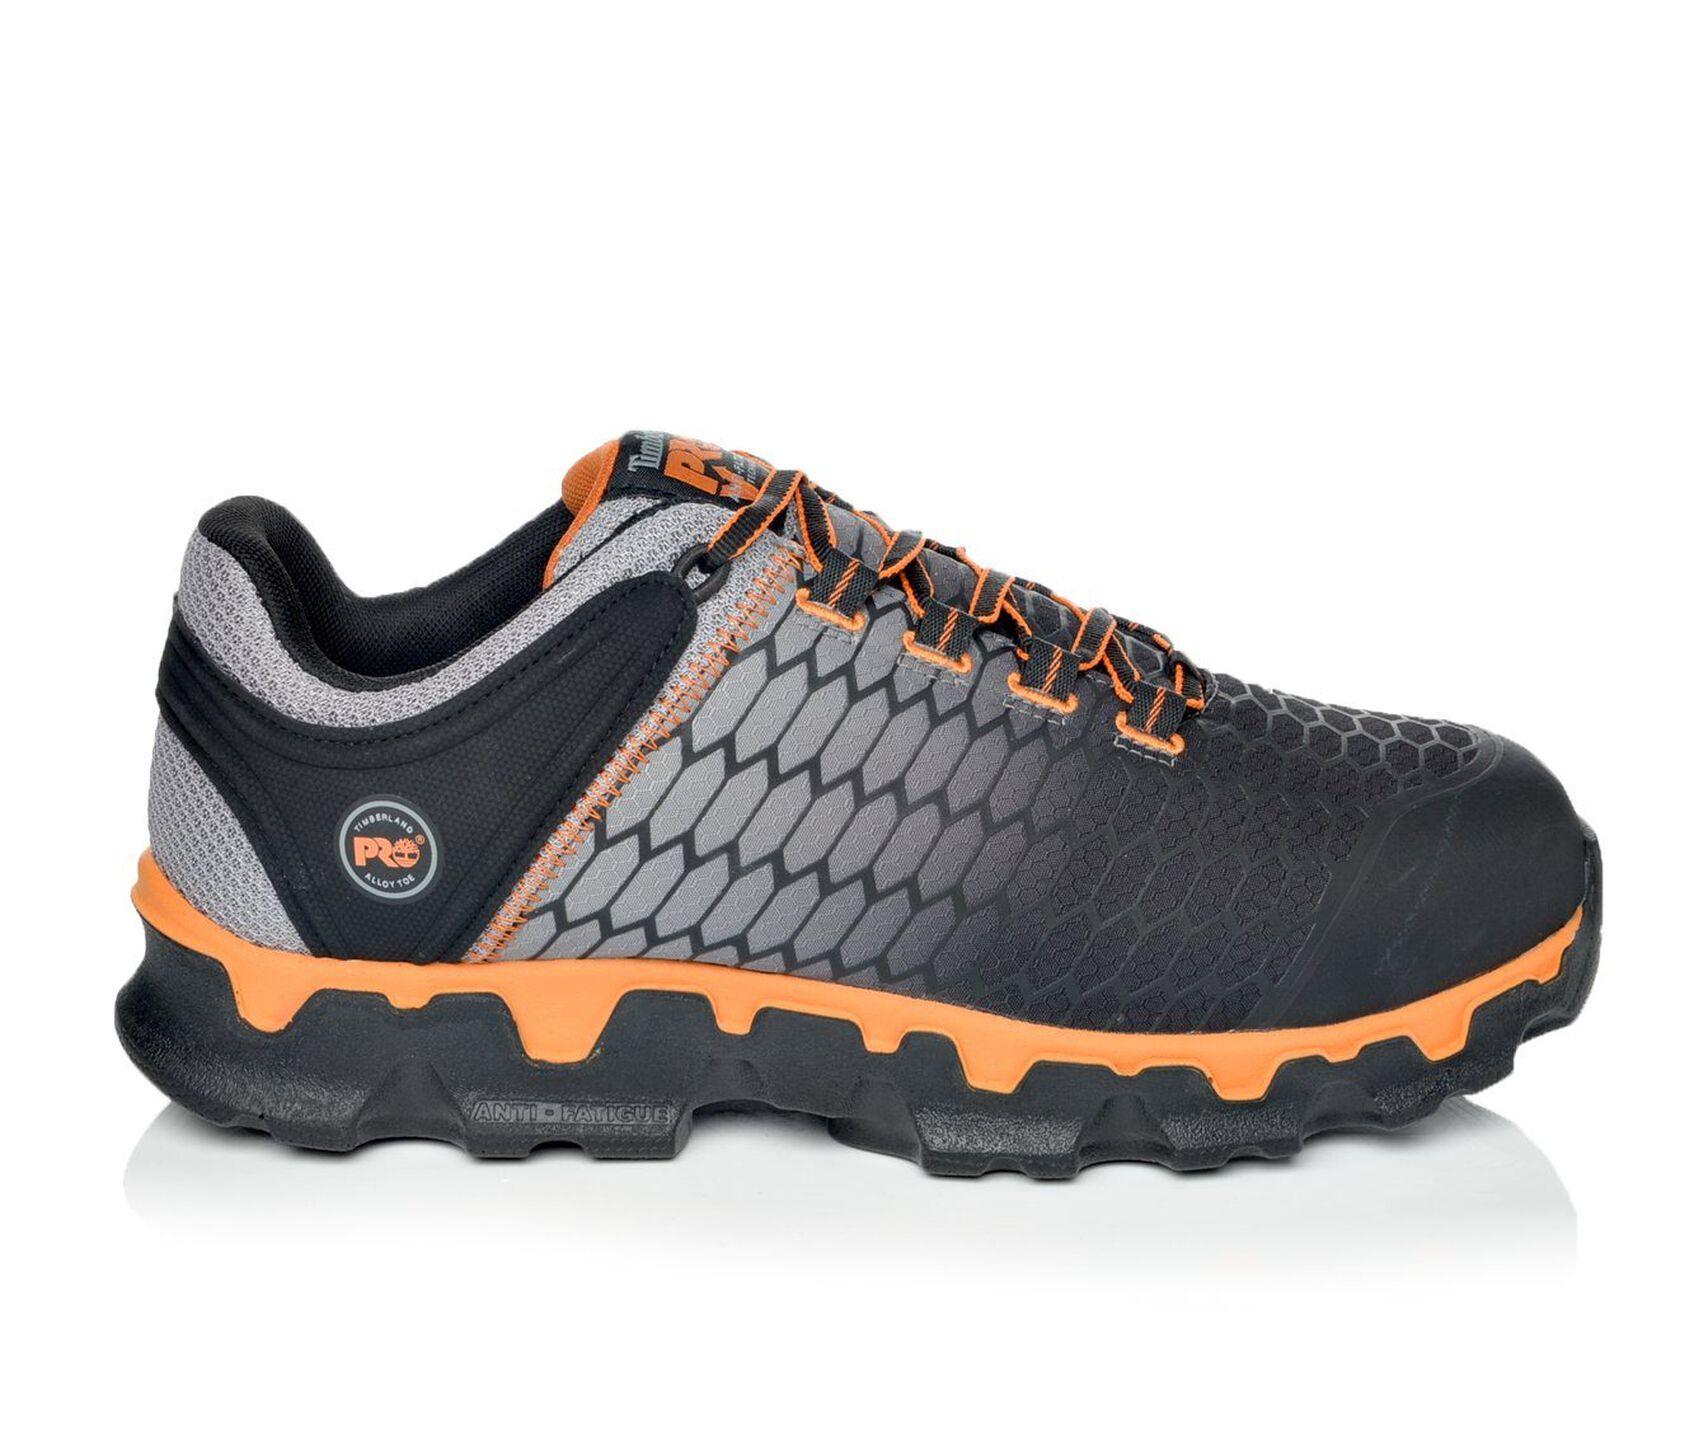 5eb6779920 Men's Timberland Pro Powertrain Sport A1GT9 Work Shoes | Shoe Carnival